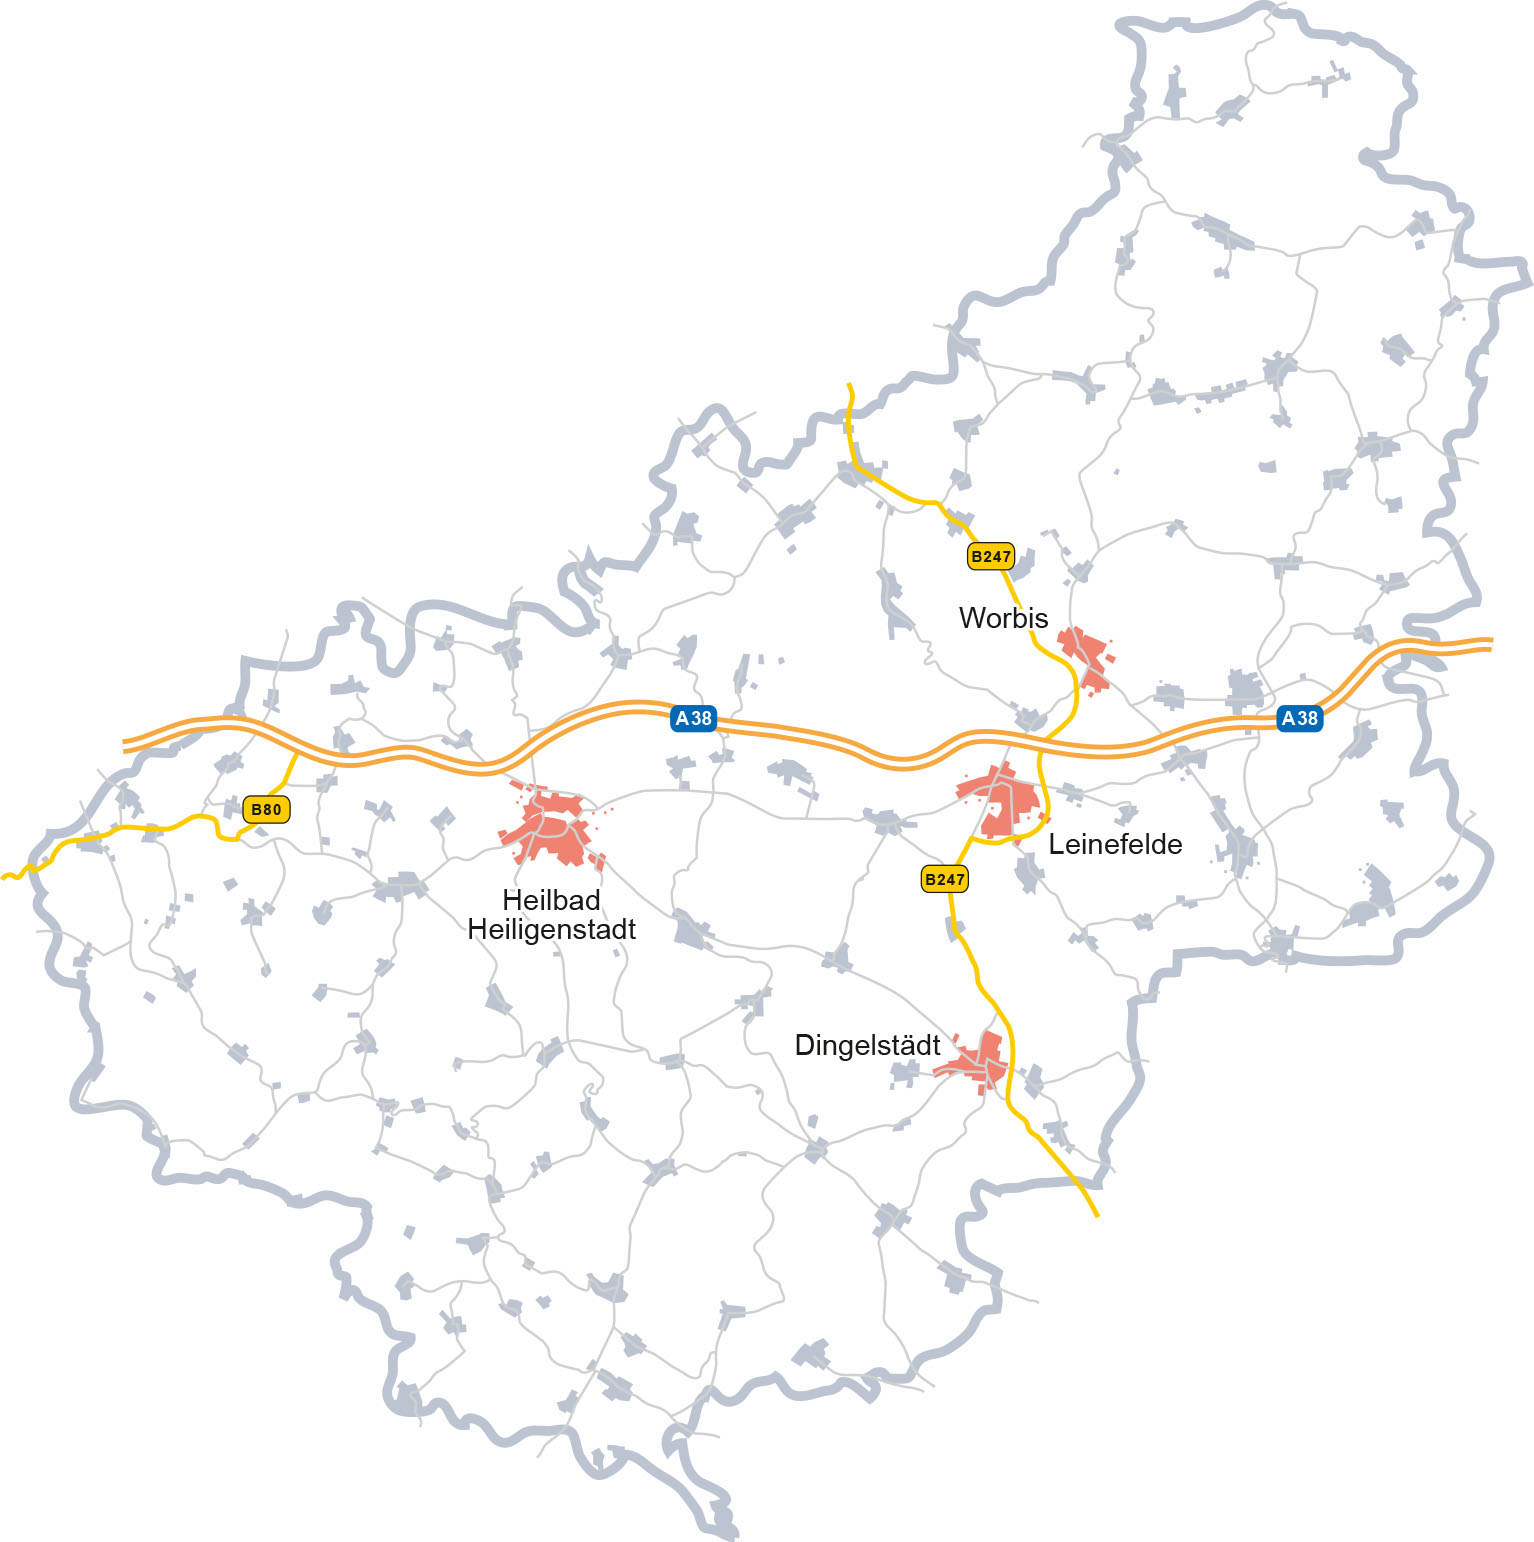 Eichsfeldwerke Gmbh Ladenetzkarte